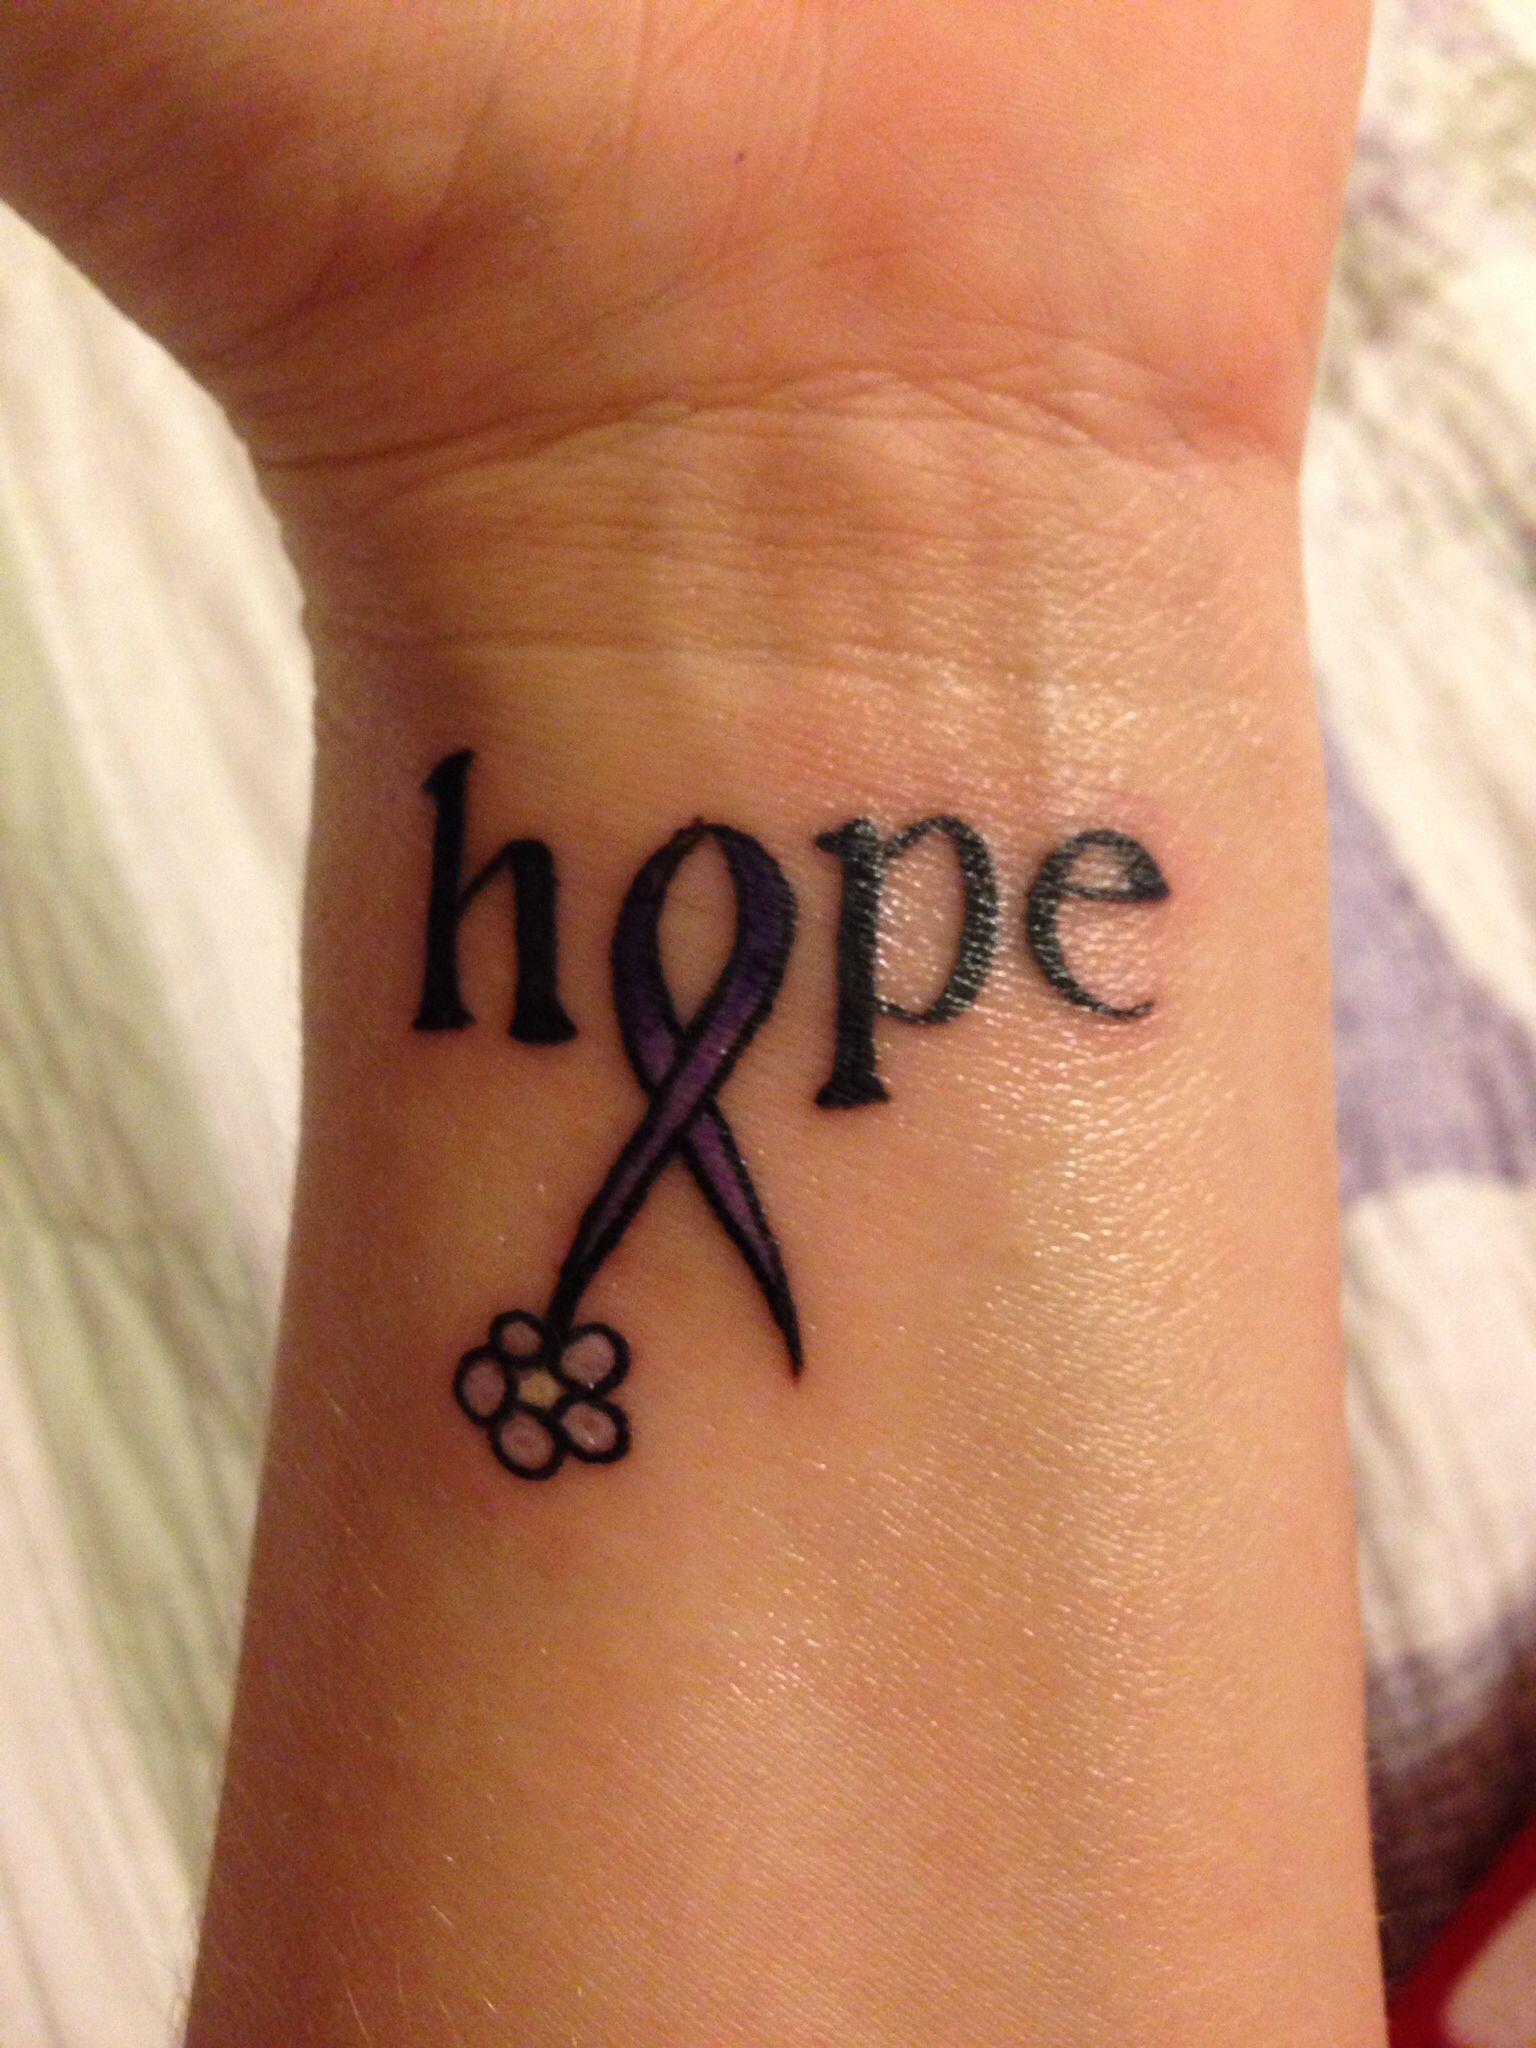 Tatouage d espoir galerie tatouage - Tatouage diamant signification ...